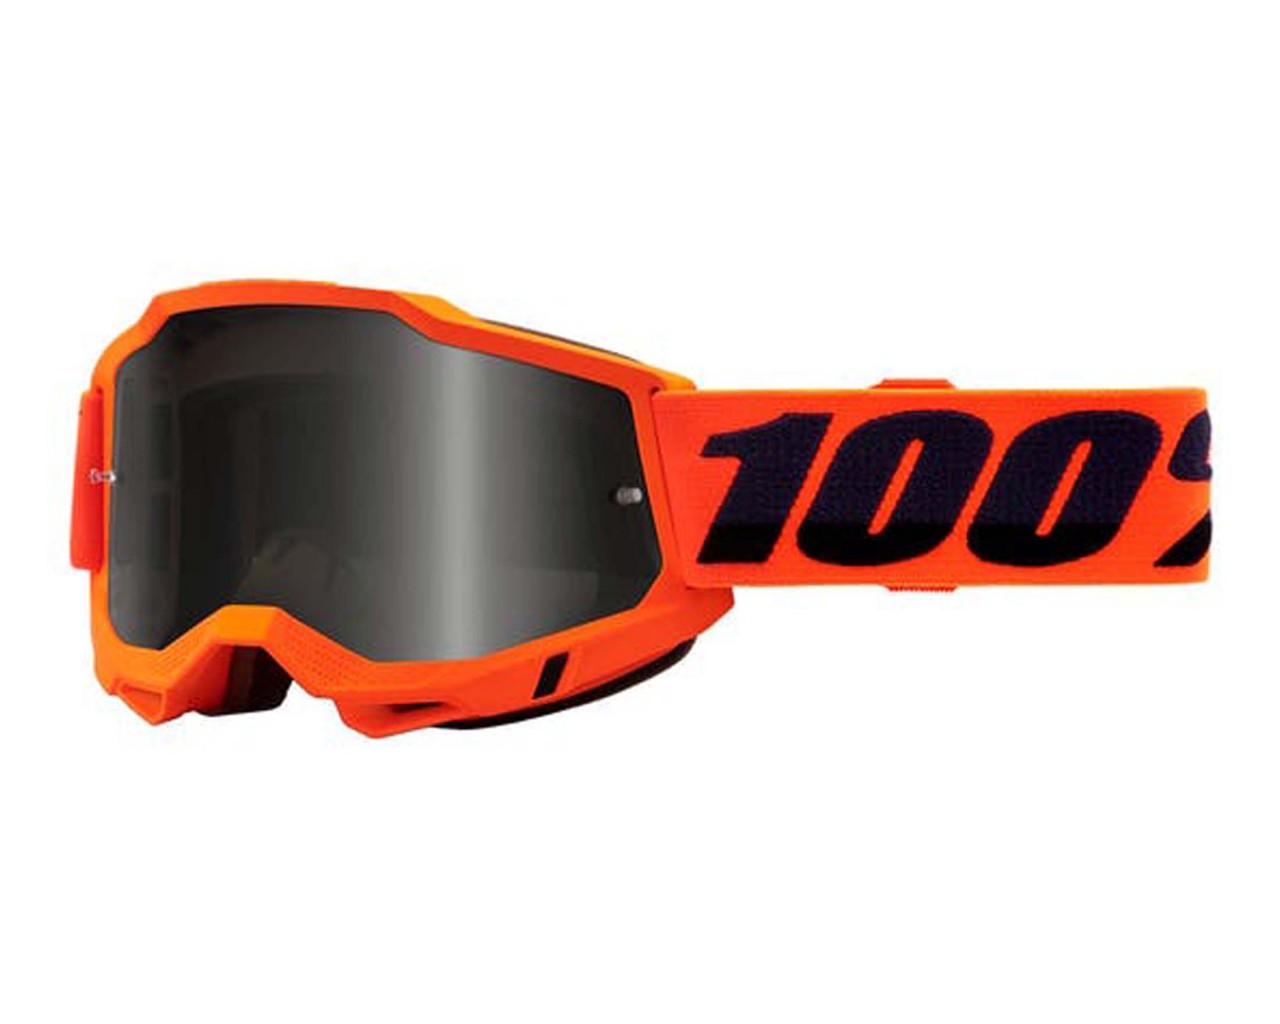 100% Accuri Generation 2 goggle - anti fog mirror lens | Neon Orange